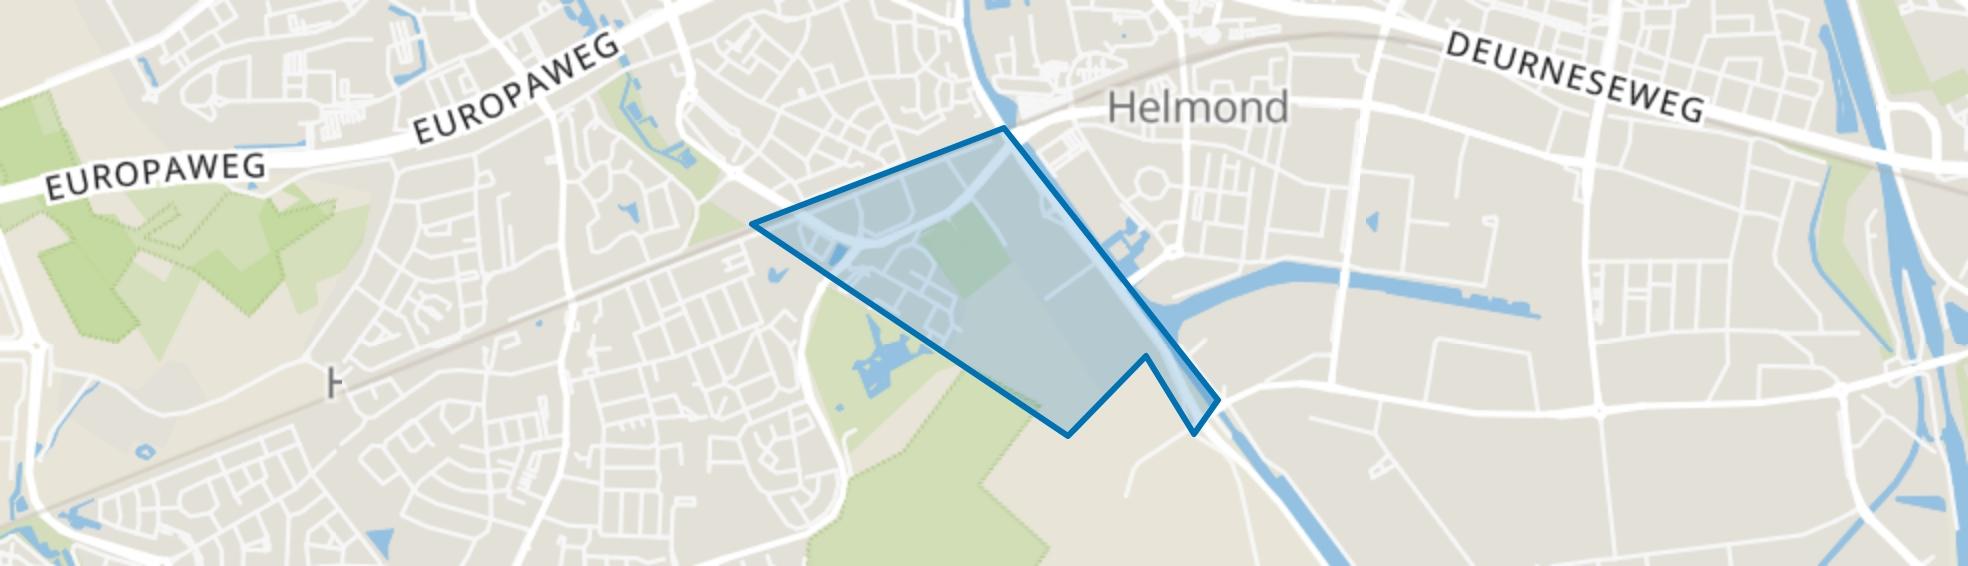 Houtsdonk, Helmond map